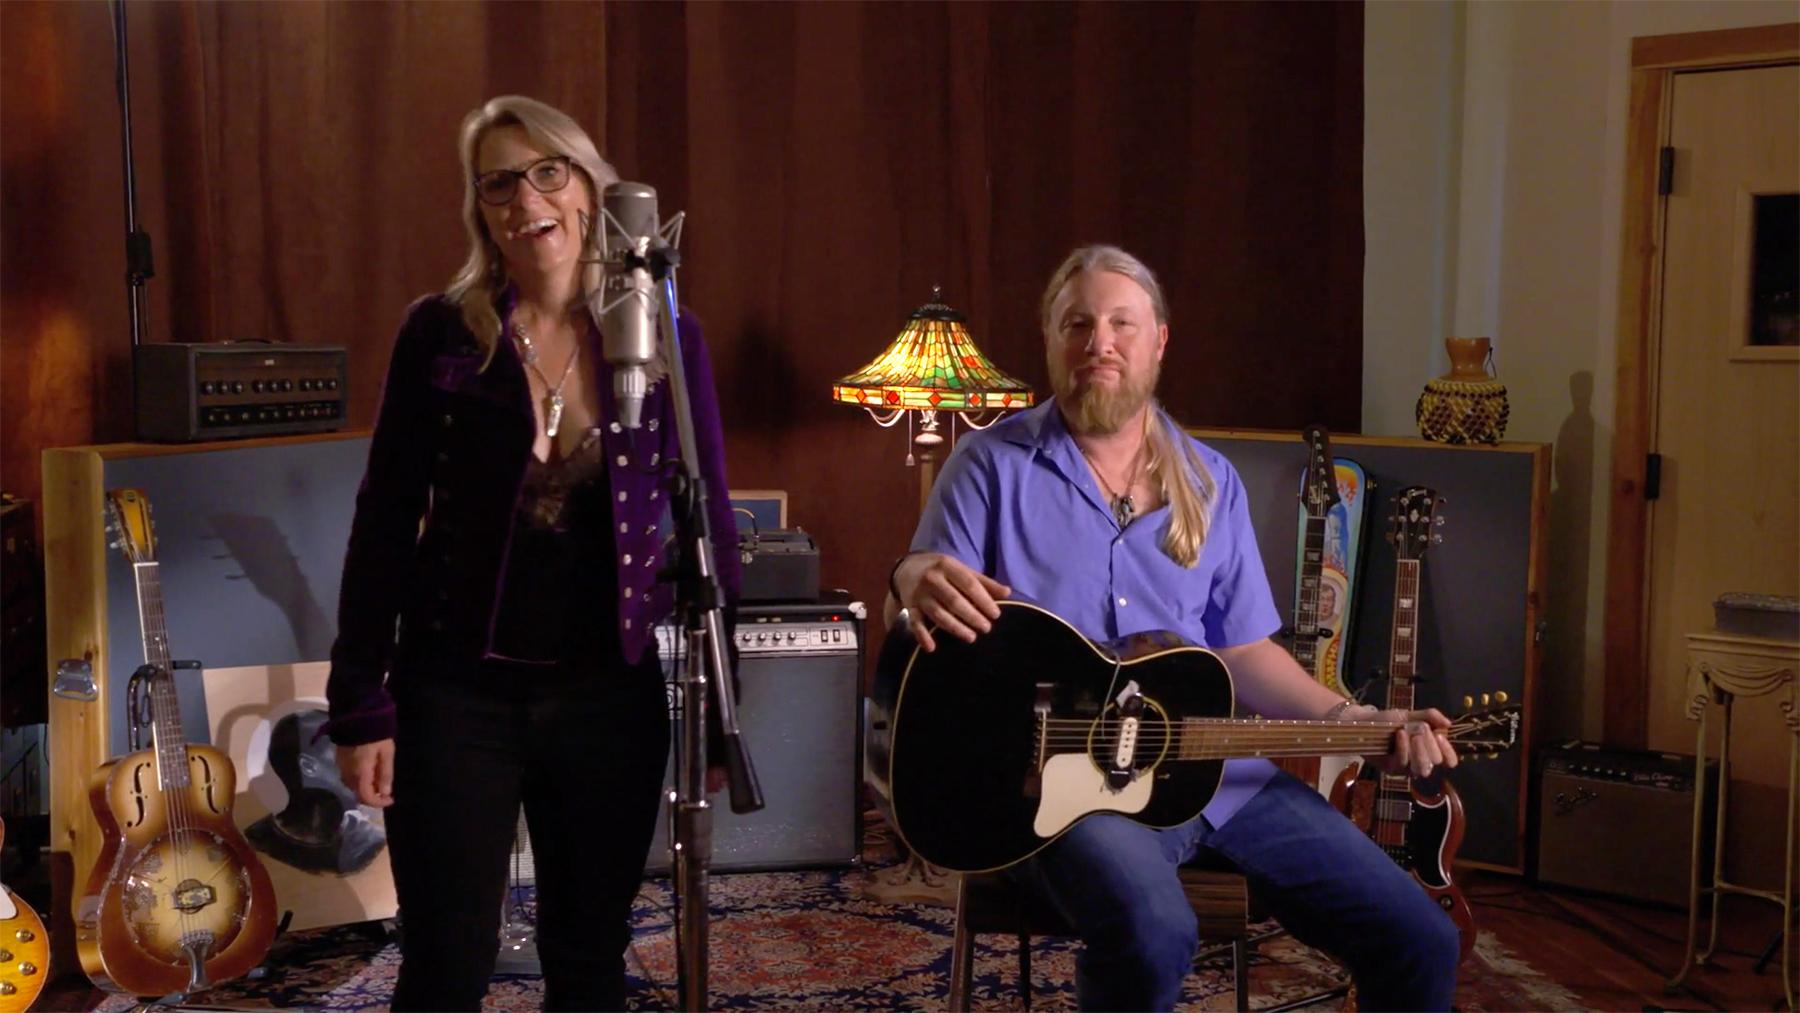 Watch Billy Gibbons Jam With Derek Trucks and Susan Tedeschi for Guitar Legends 4